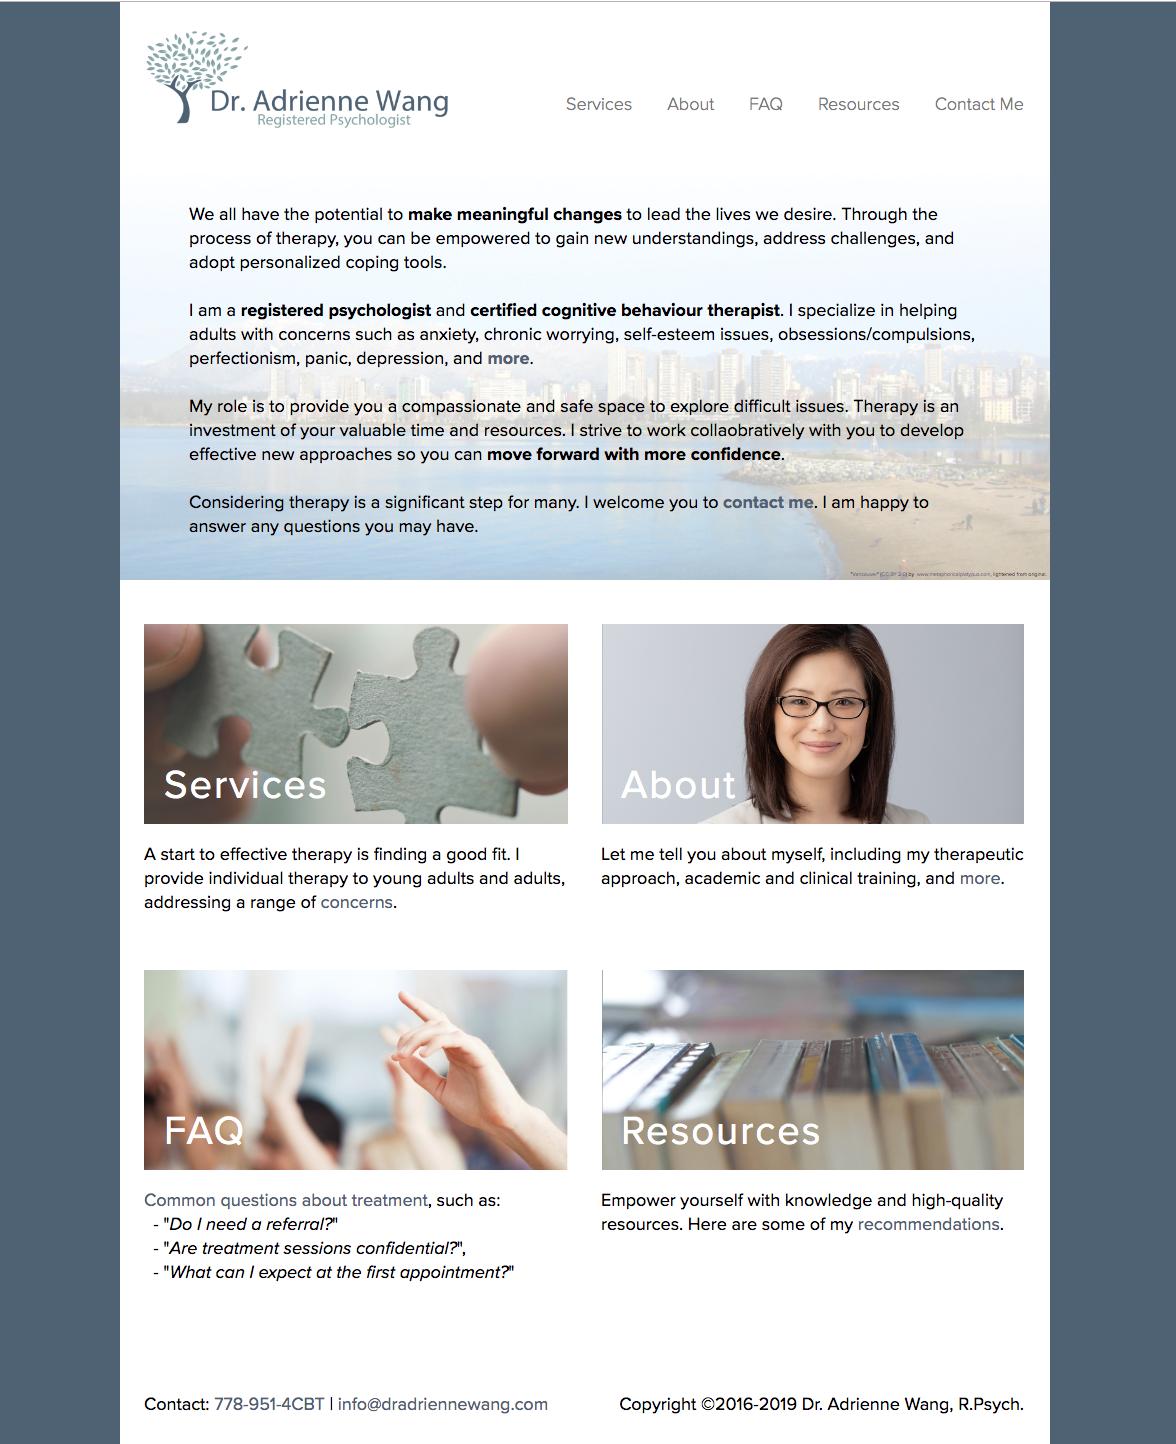 Current design of website's homepage.